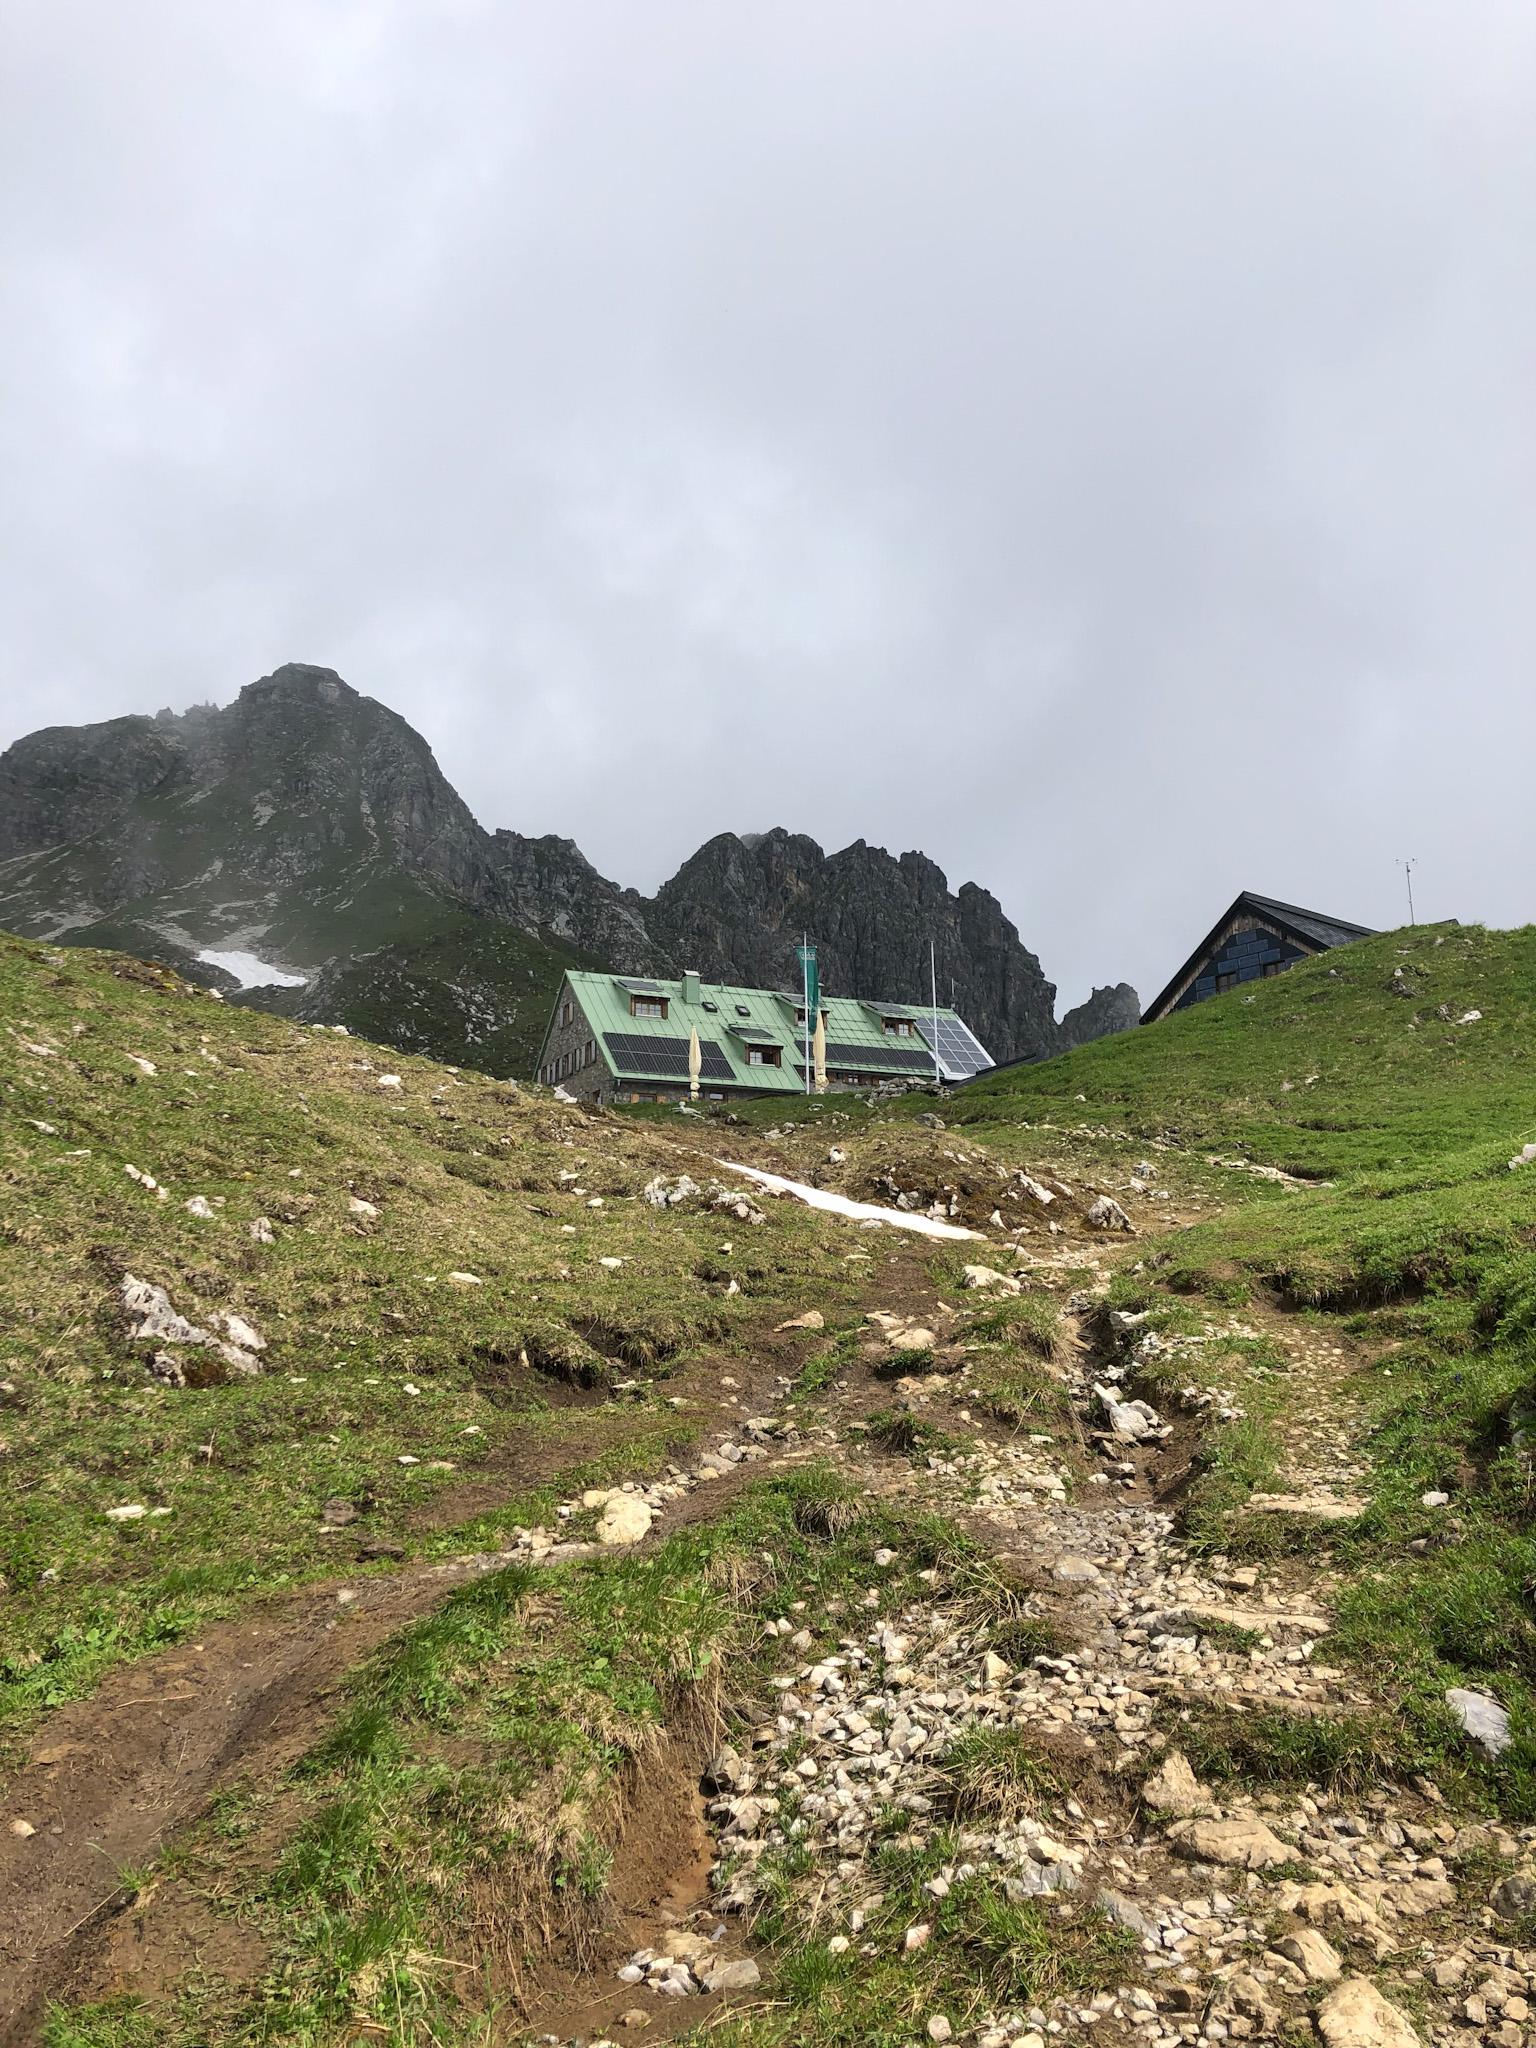 Le refuge de Mindelheimer dans les Alpes d'Allgäu